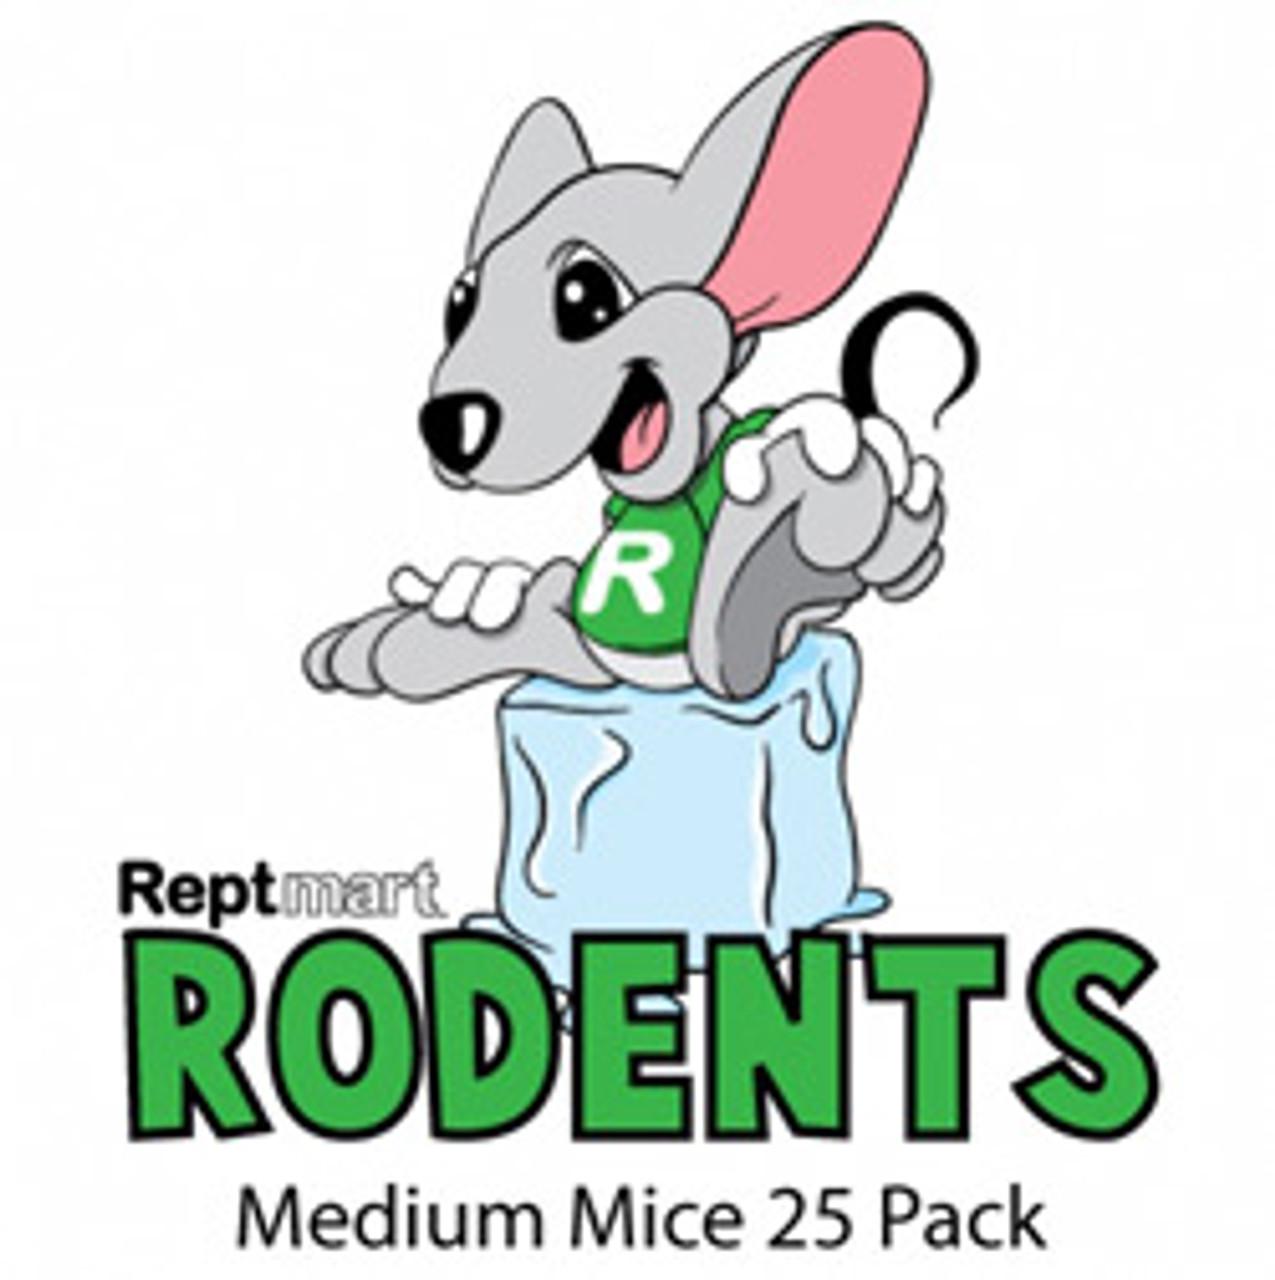 Medium Mice 25 Pack (13-17g)